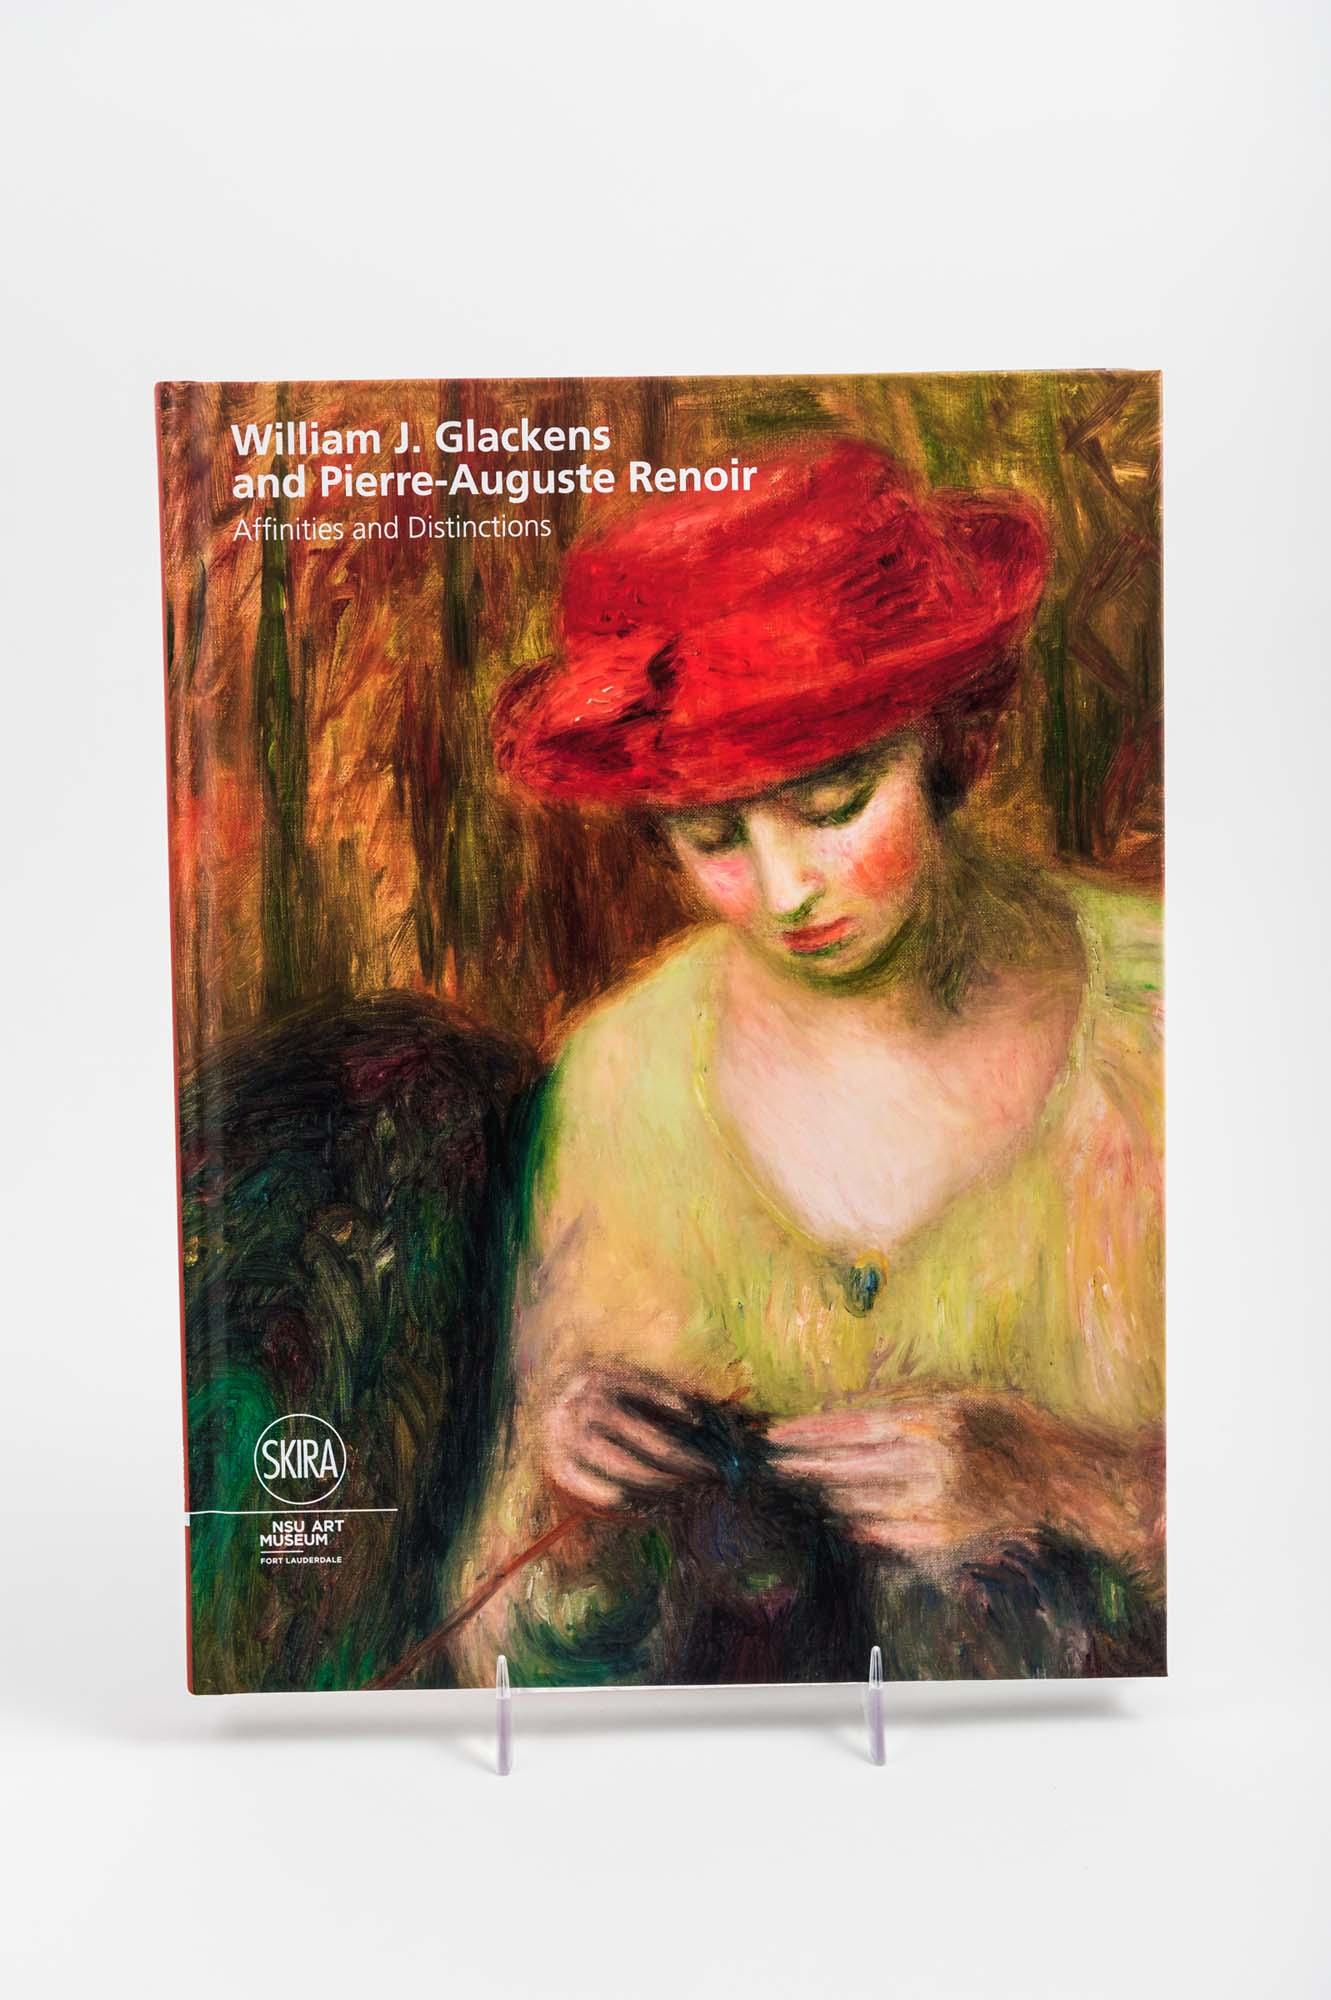 William J. Glackens and Pierre Auguste Renoir Books